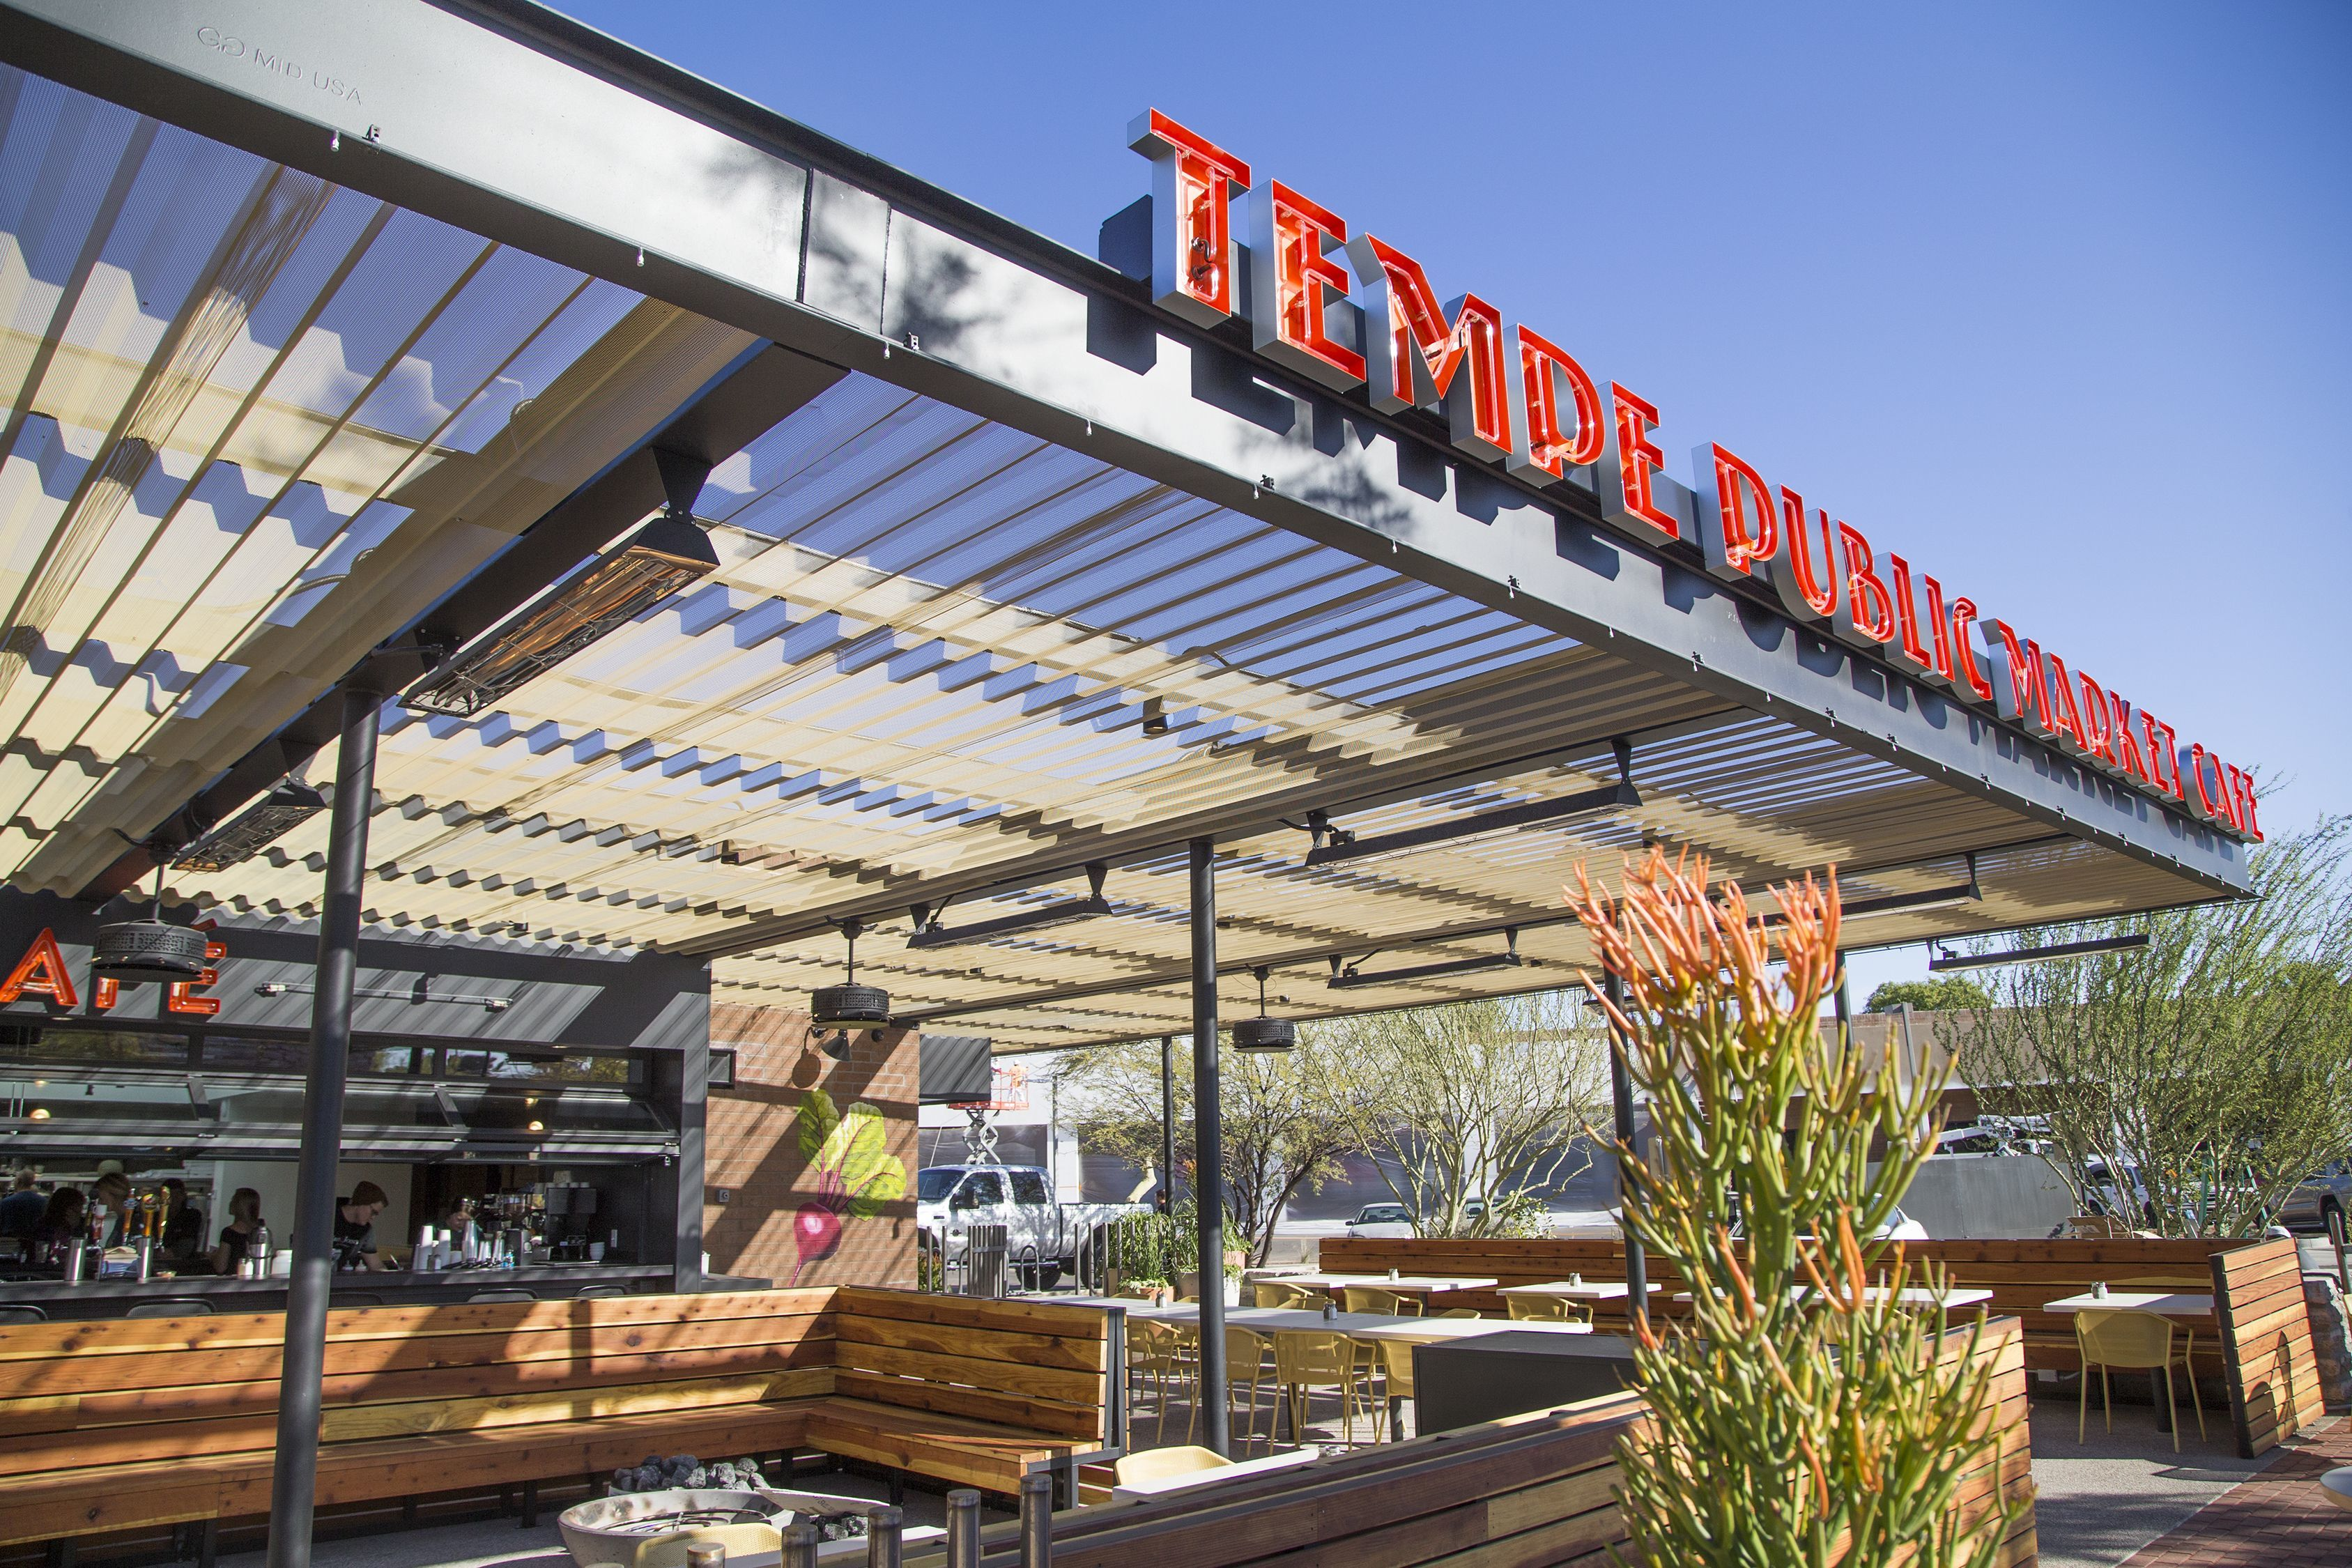 Tempe Public Market Cafe   Nov. 12, buy one entree,get one free.   Details: 8749 S. Rural Road, Tempe. 480-629-5120, tempepublicmarket.com.